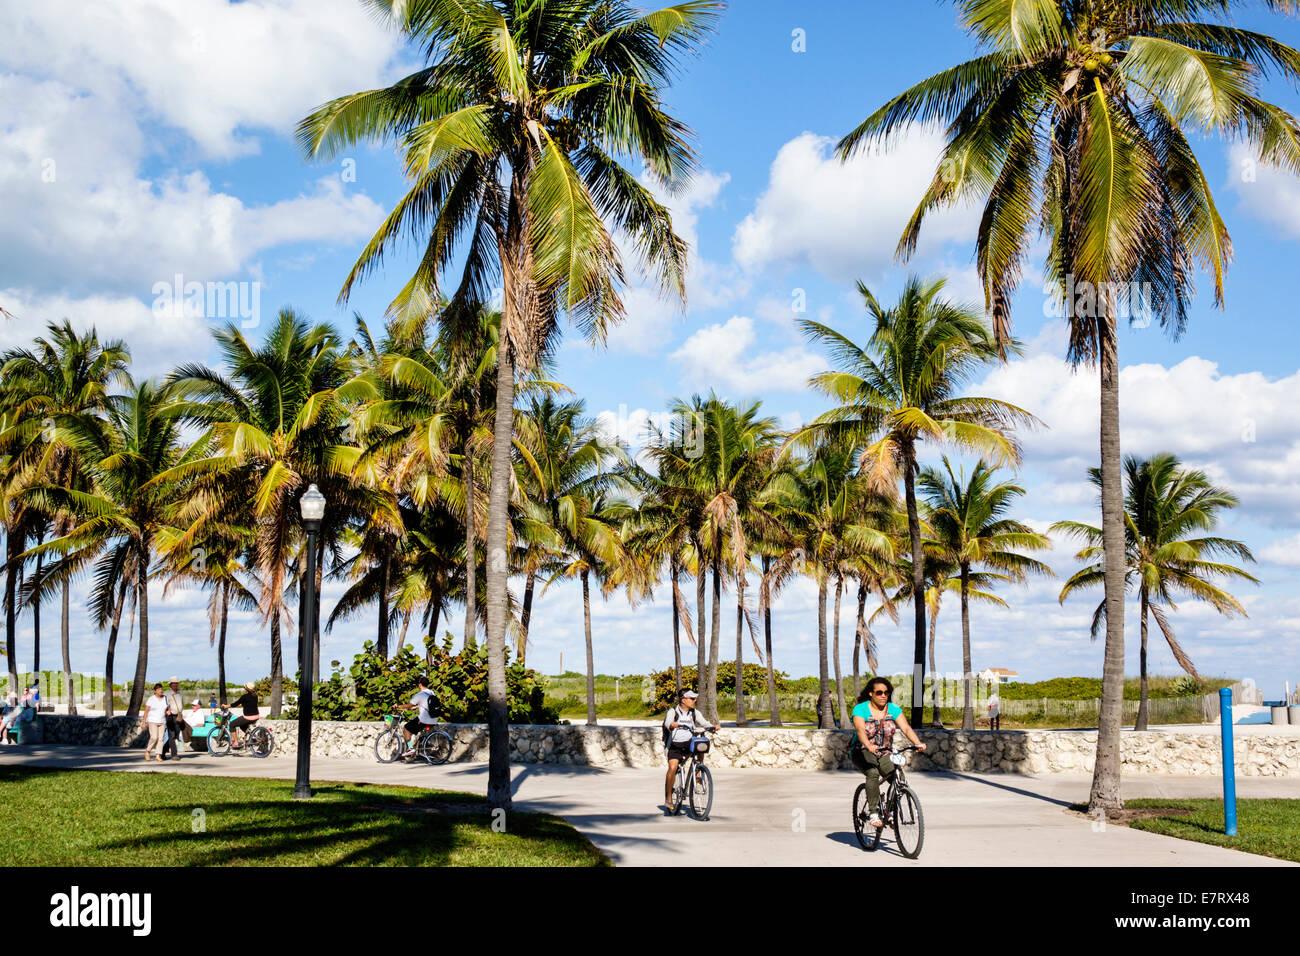 Miami Beach Florida Lummus Park Serpentine Trail palm trees bicycle path woman biking bicycle good weather tropical - Stock Image